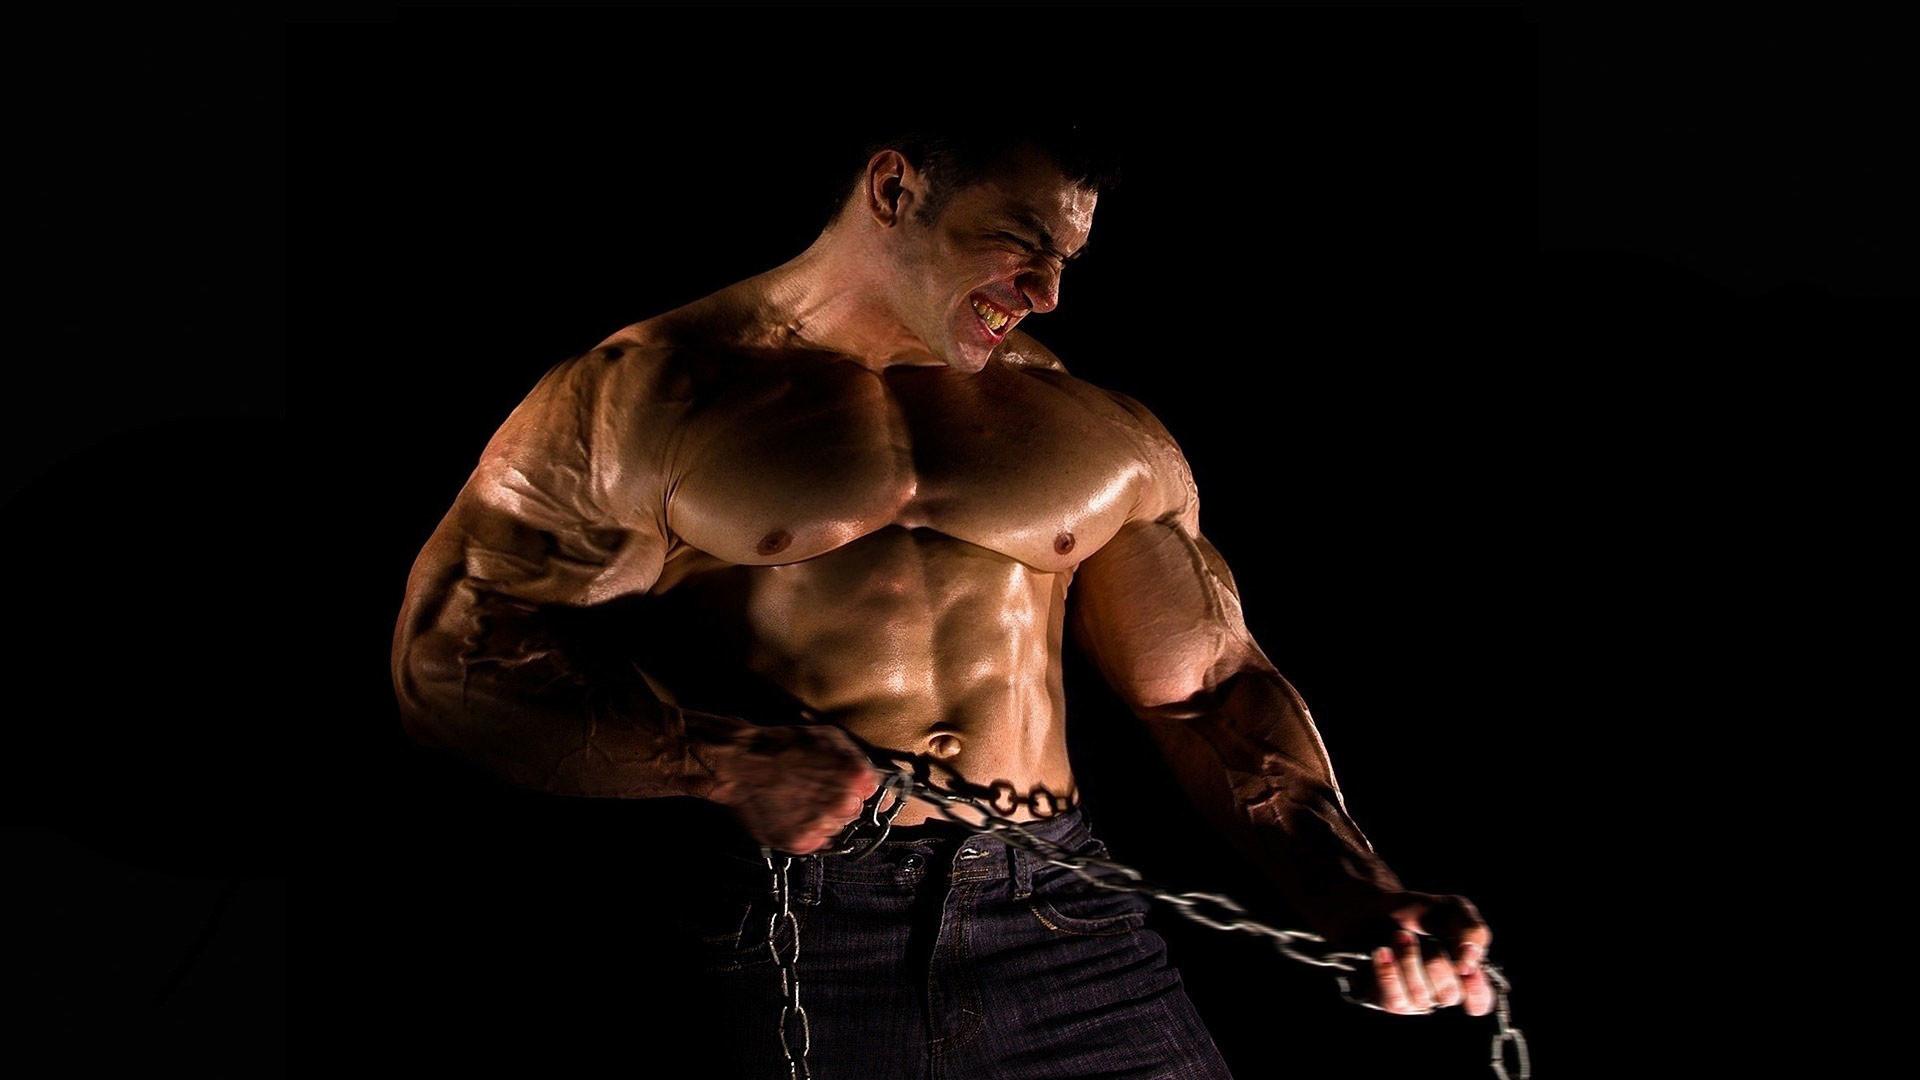 hd pics photos best body building workout motivation muscles hd quality  desktop background wallpaper